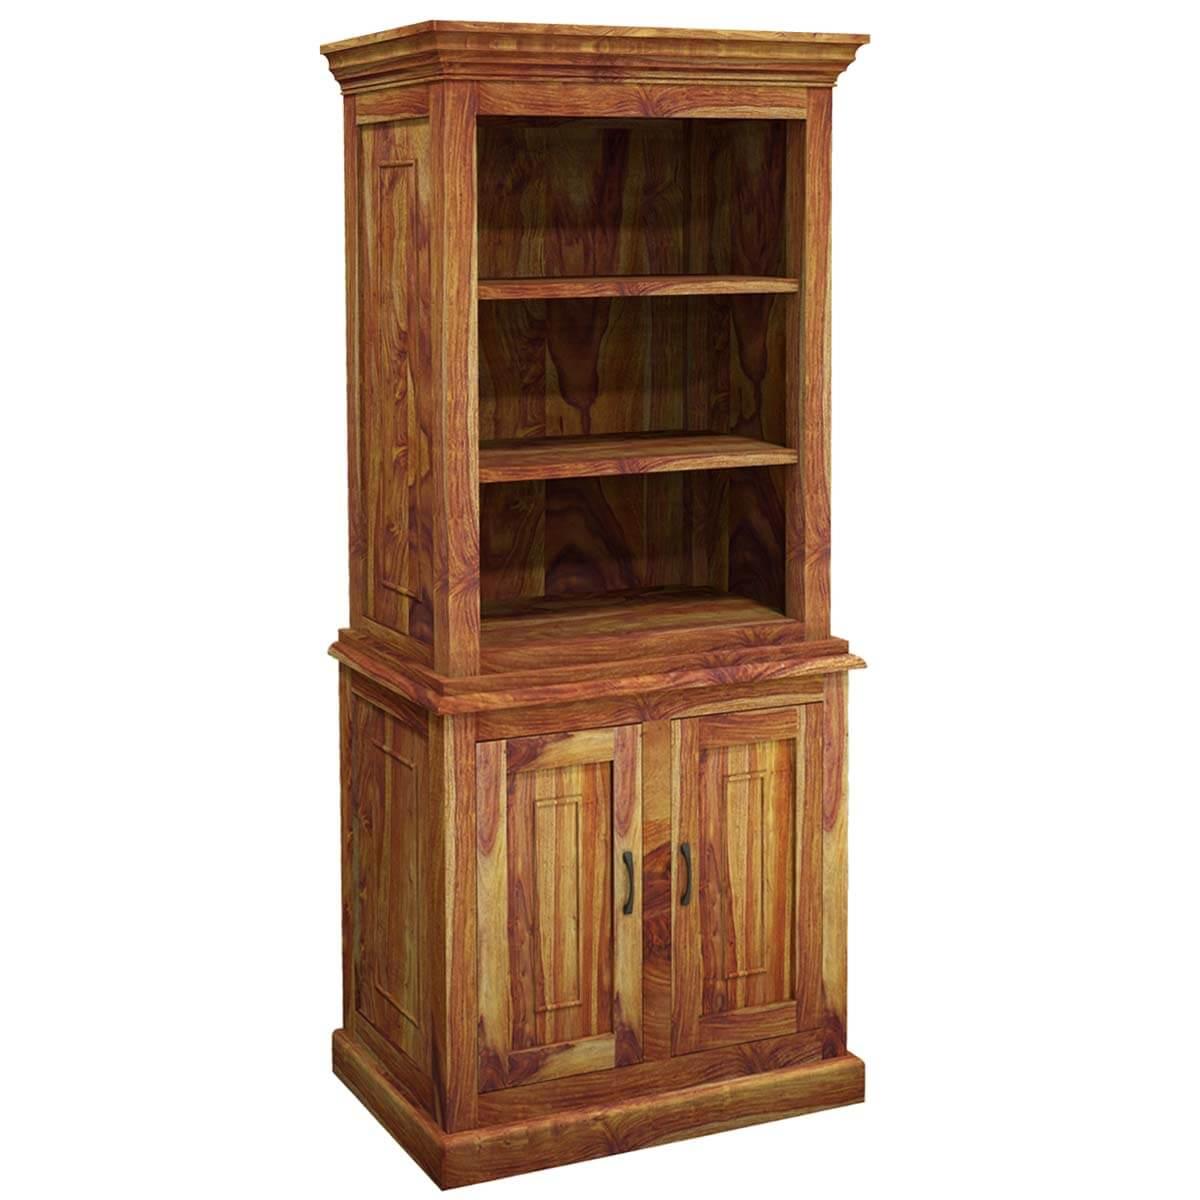 Wood Storage Cabinets: Idaho Modern Solid Wood Standard Bookcase Storage Cabinet